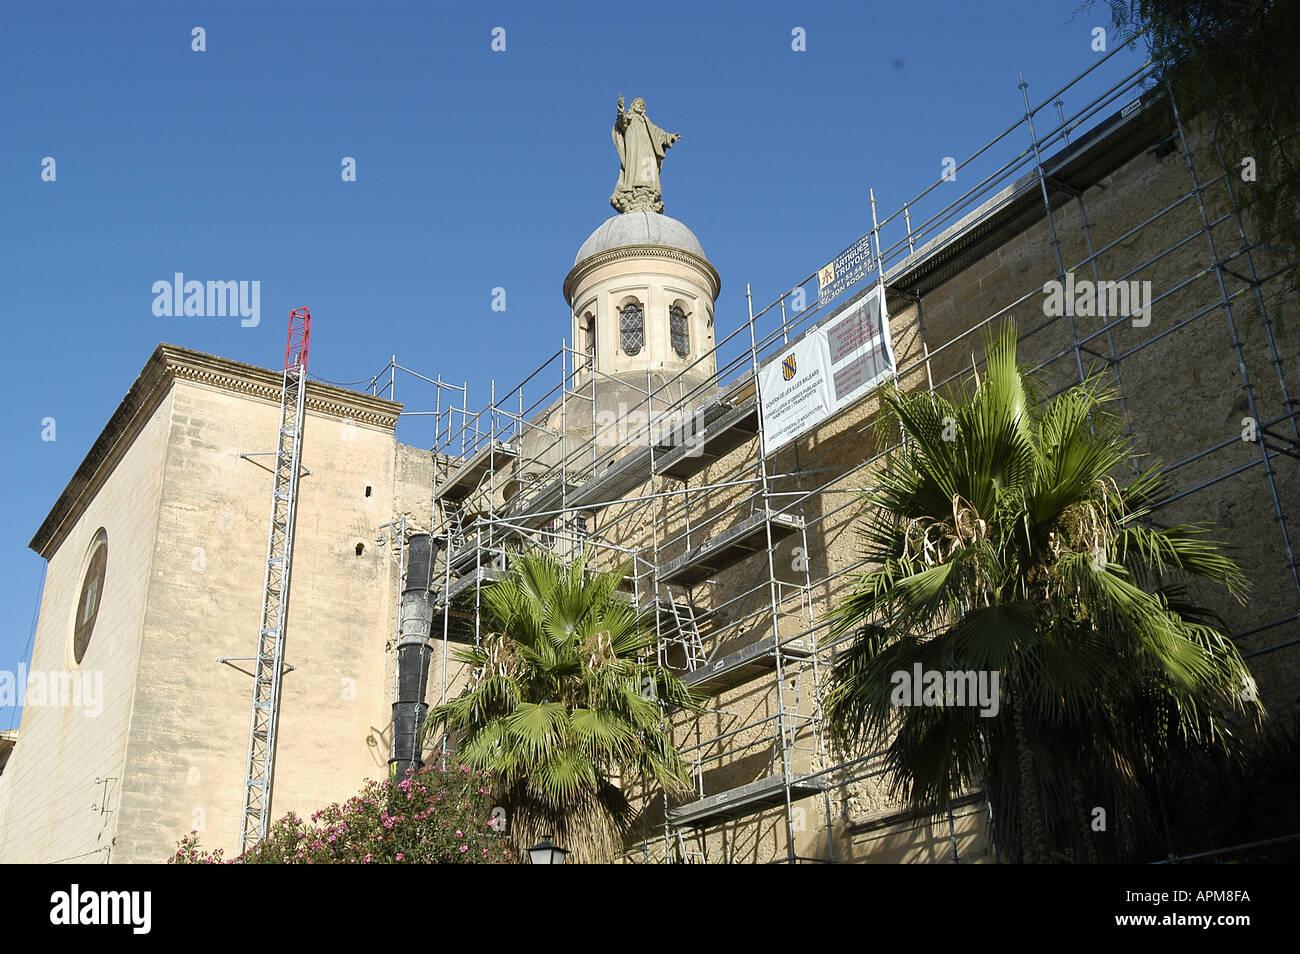 Apm Mallorca vilafranca de bonany mallorca majorca spain europe mediterranean